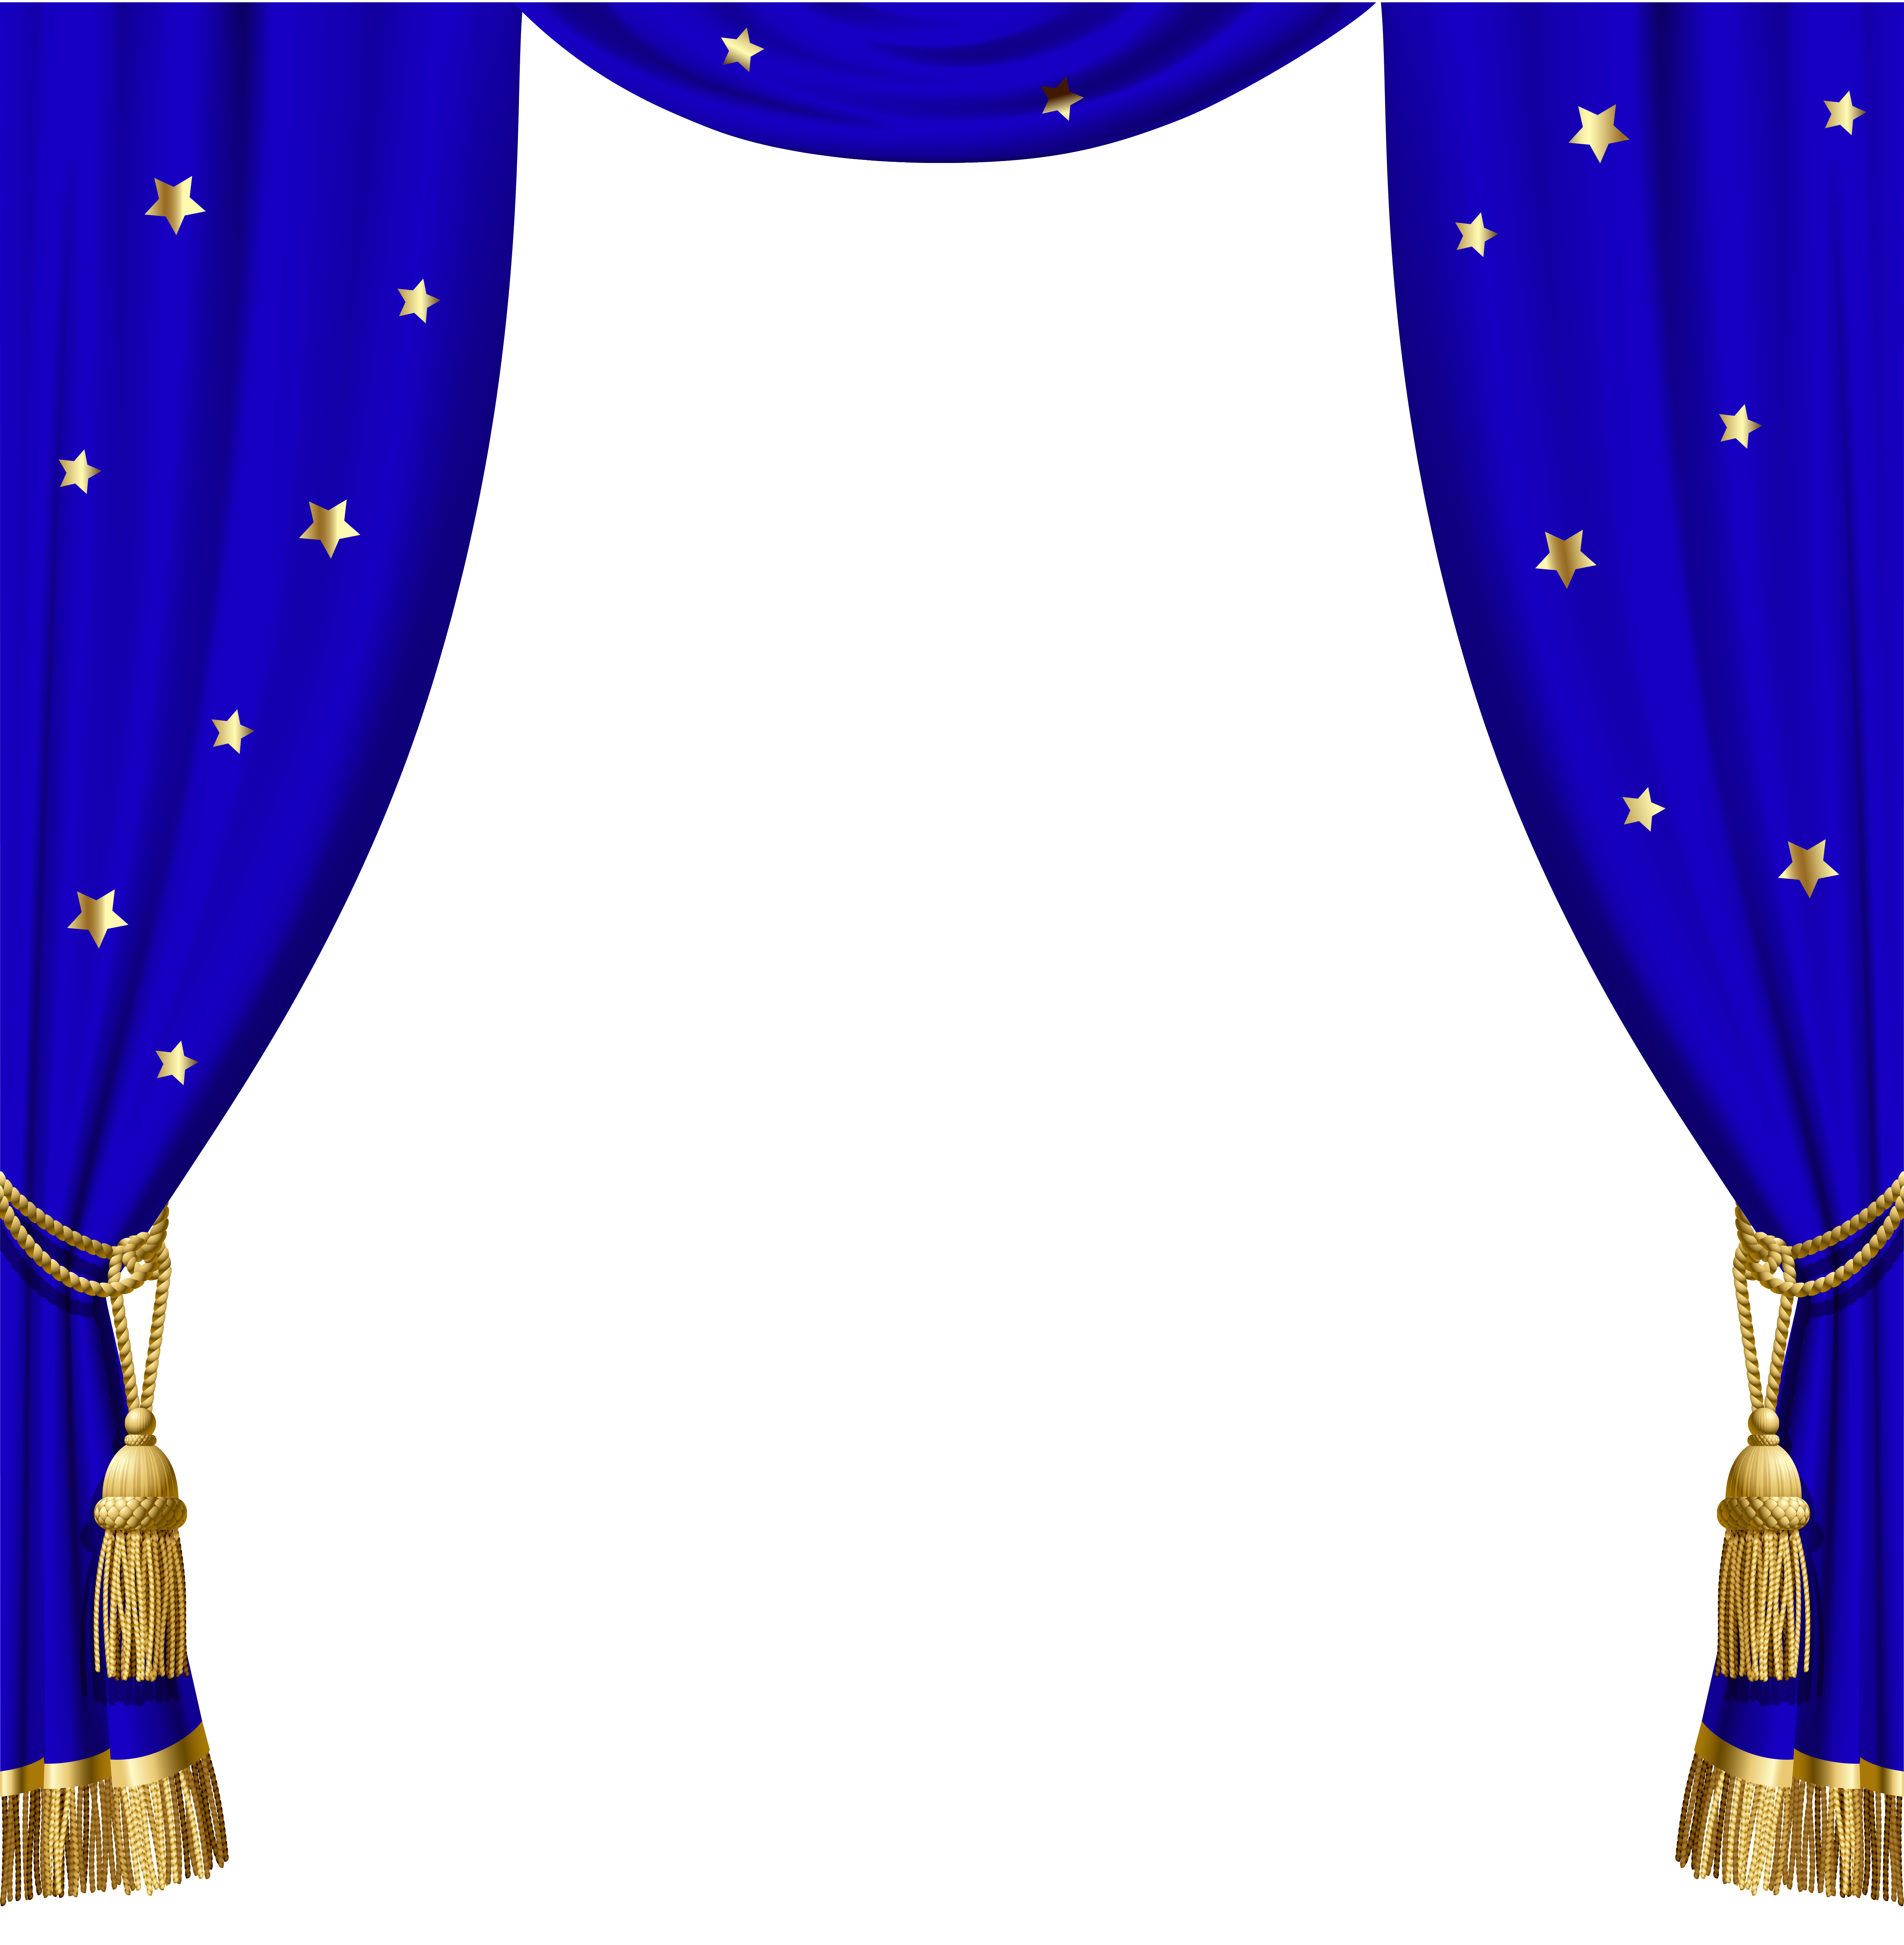 Transparent blue with gold. Curtains clipart mandap